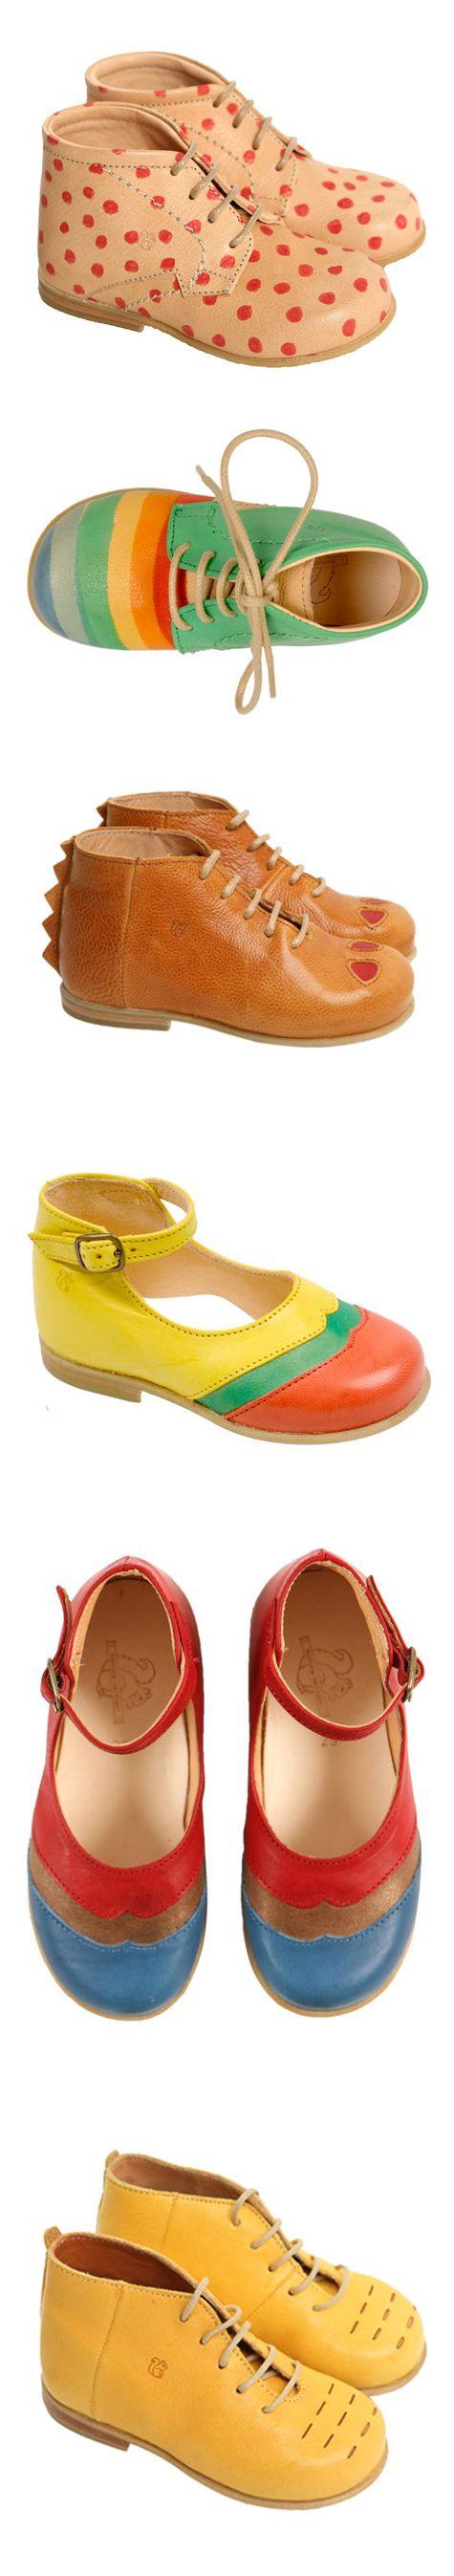 cute kids shoes...